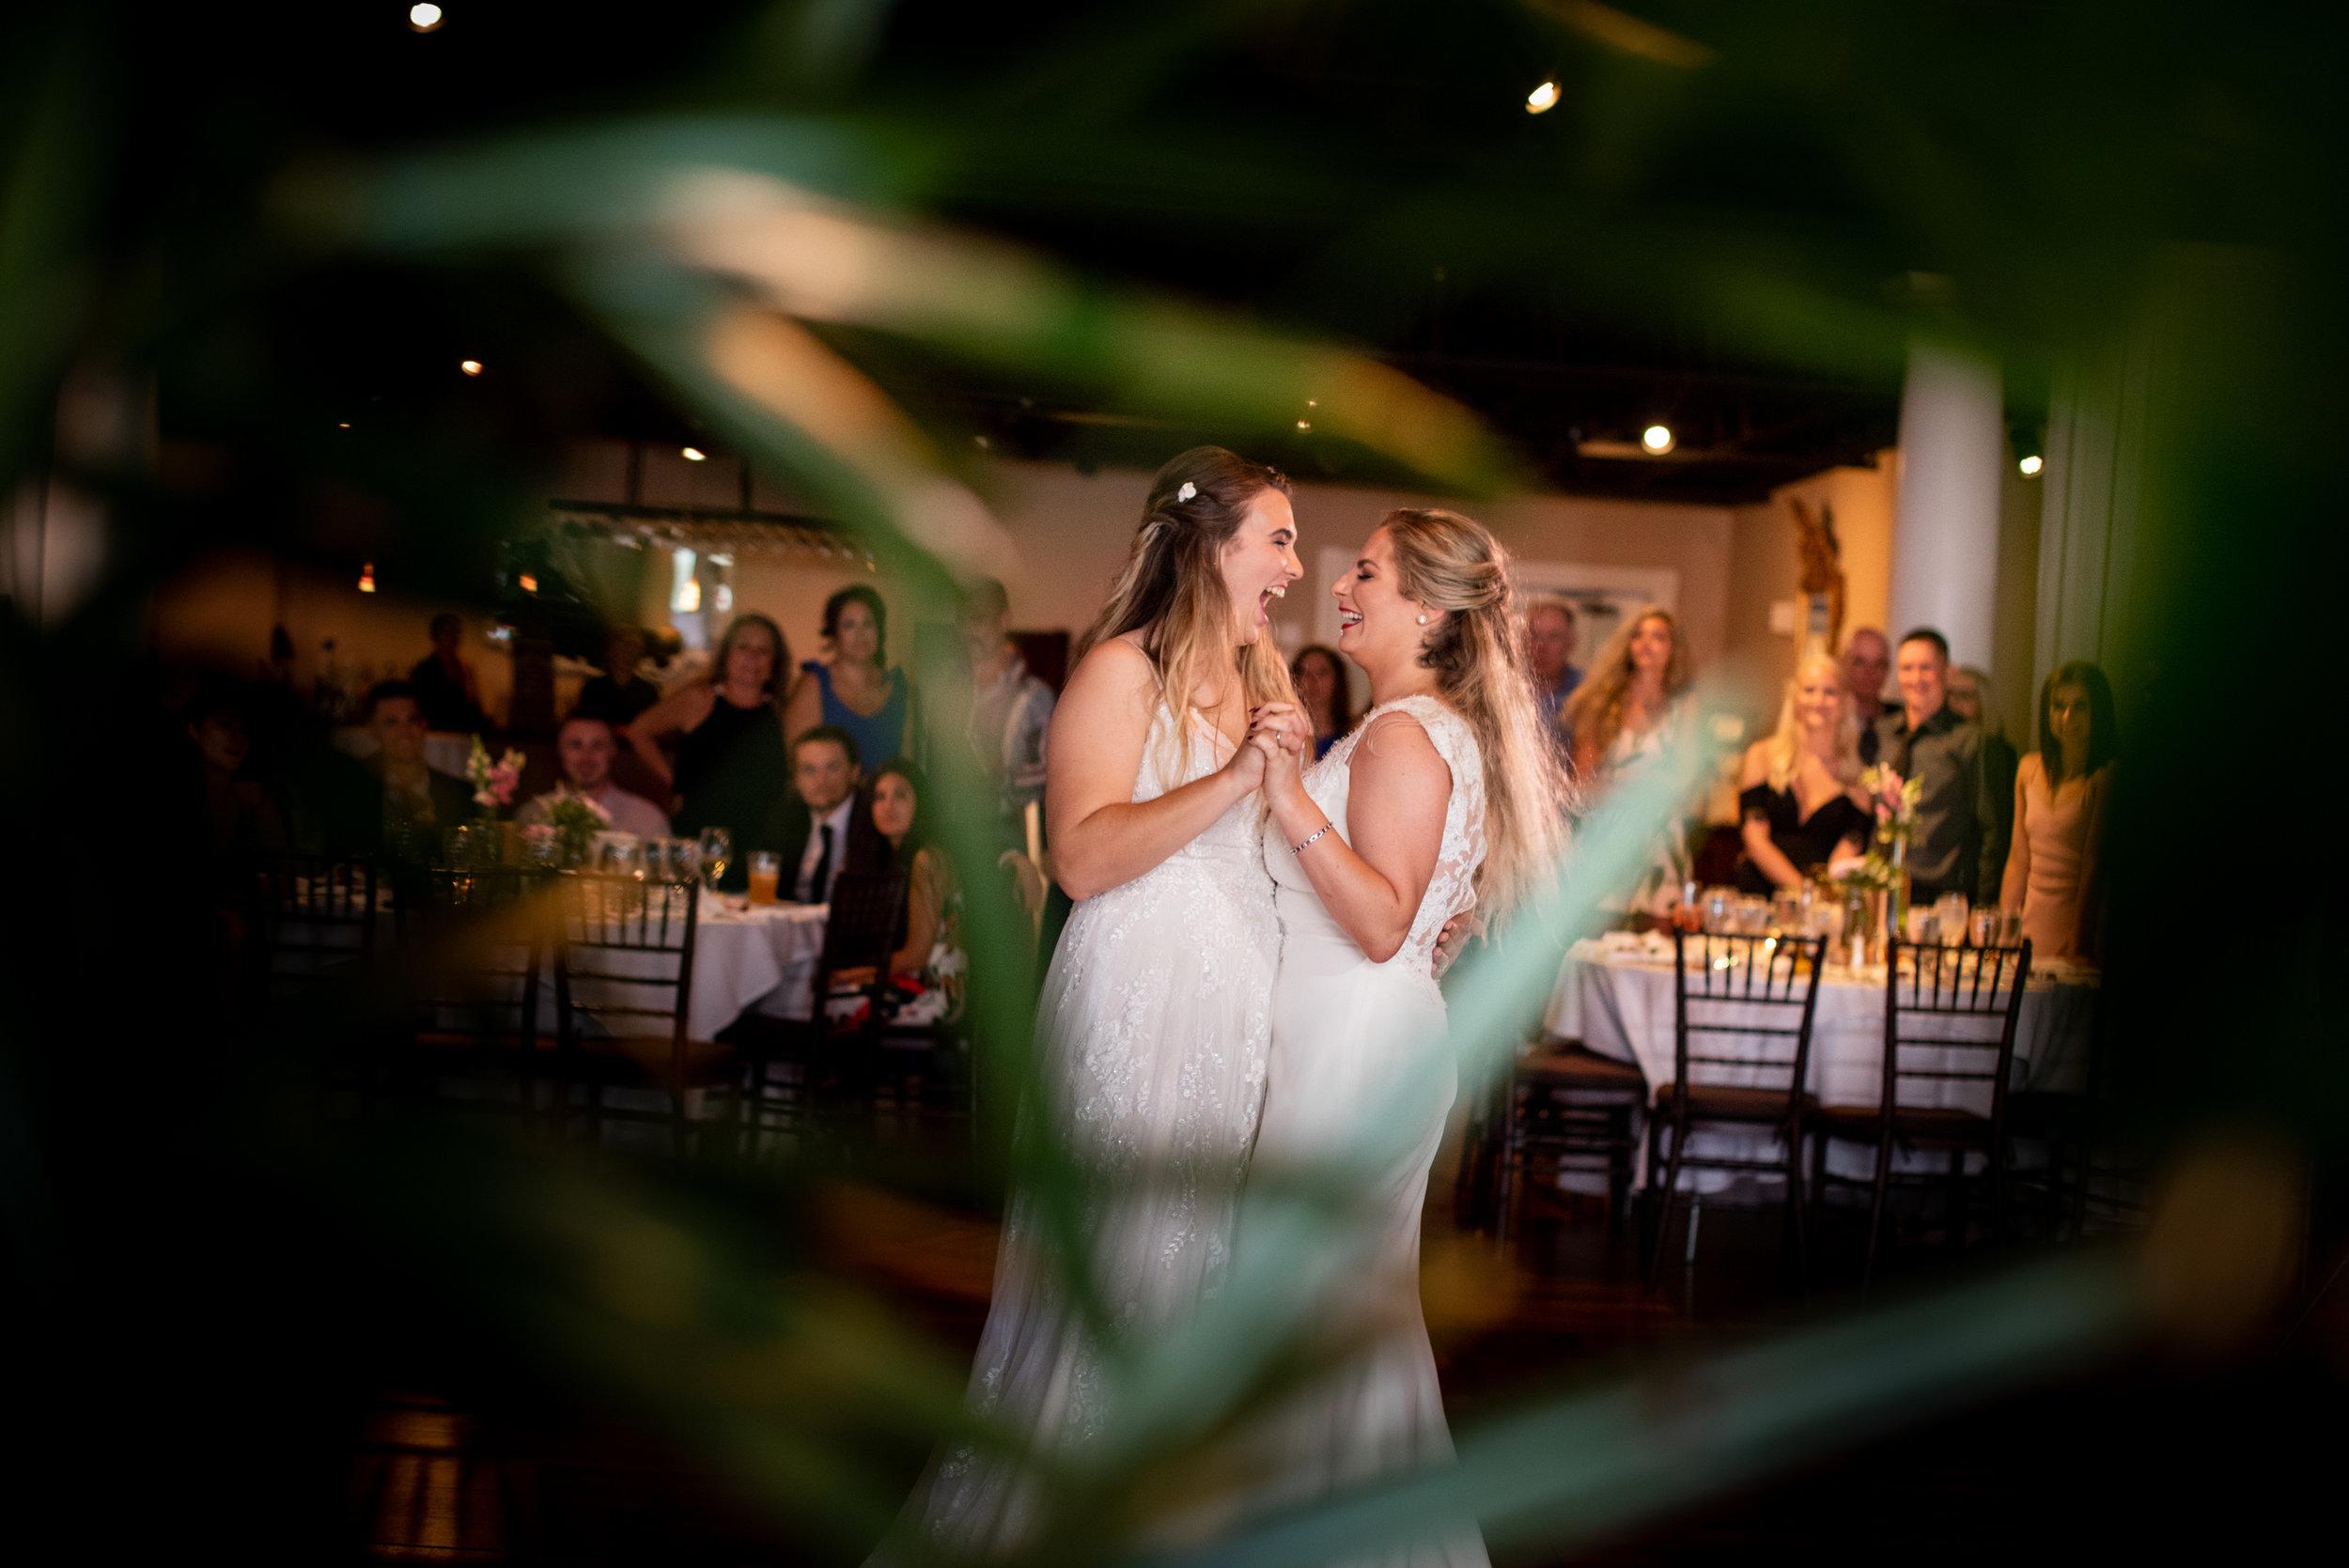 st-augustine-photographer-st-augustine-gay-wedding-sam-sex-wedding-photographer-sarah-annay-photography-white-room-weddings-57.jpg